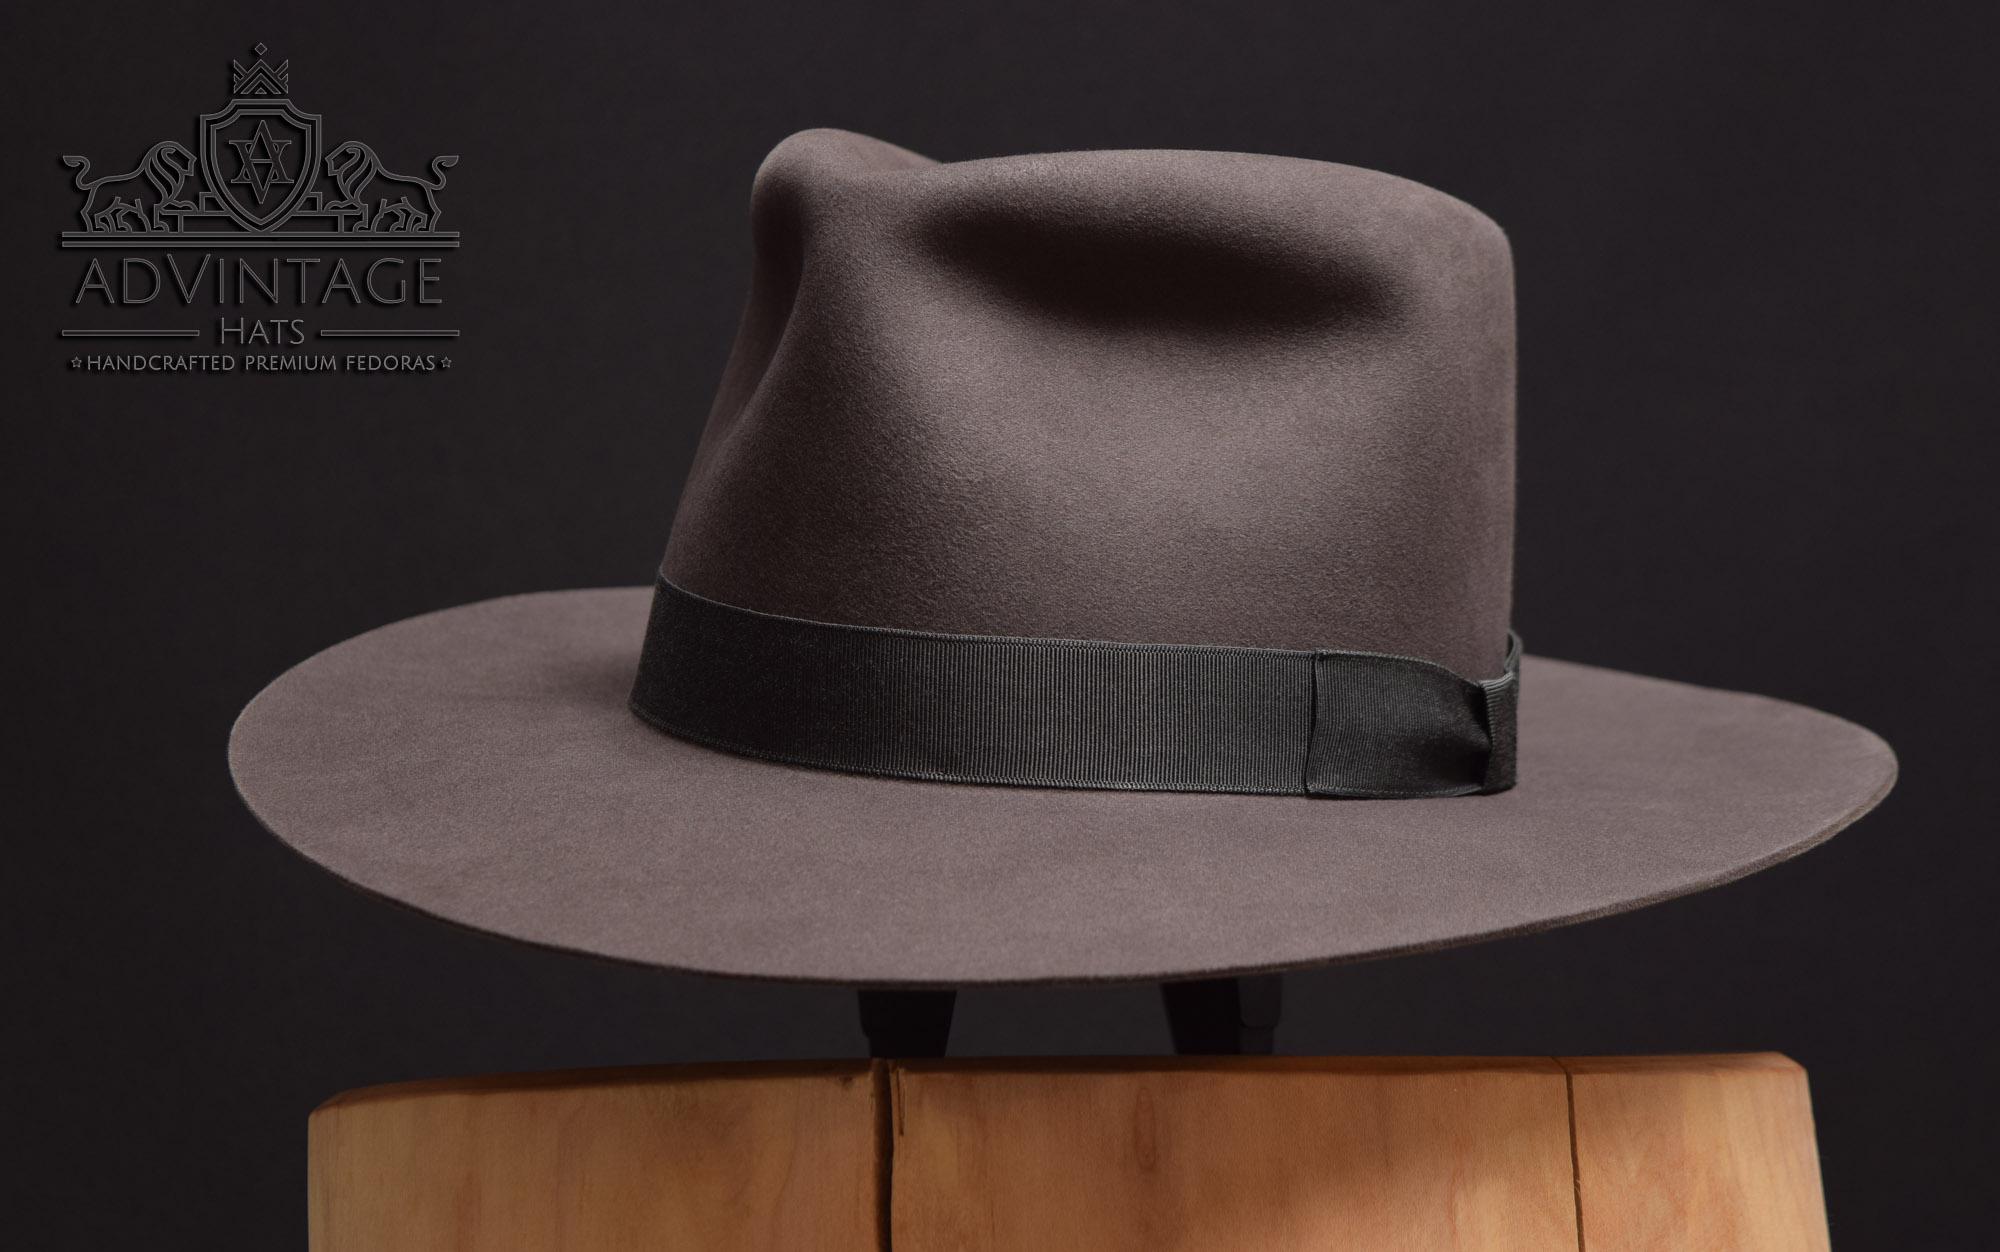 100x 100% beaver biber felt filz fedora hut hat handmade custom bespoke